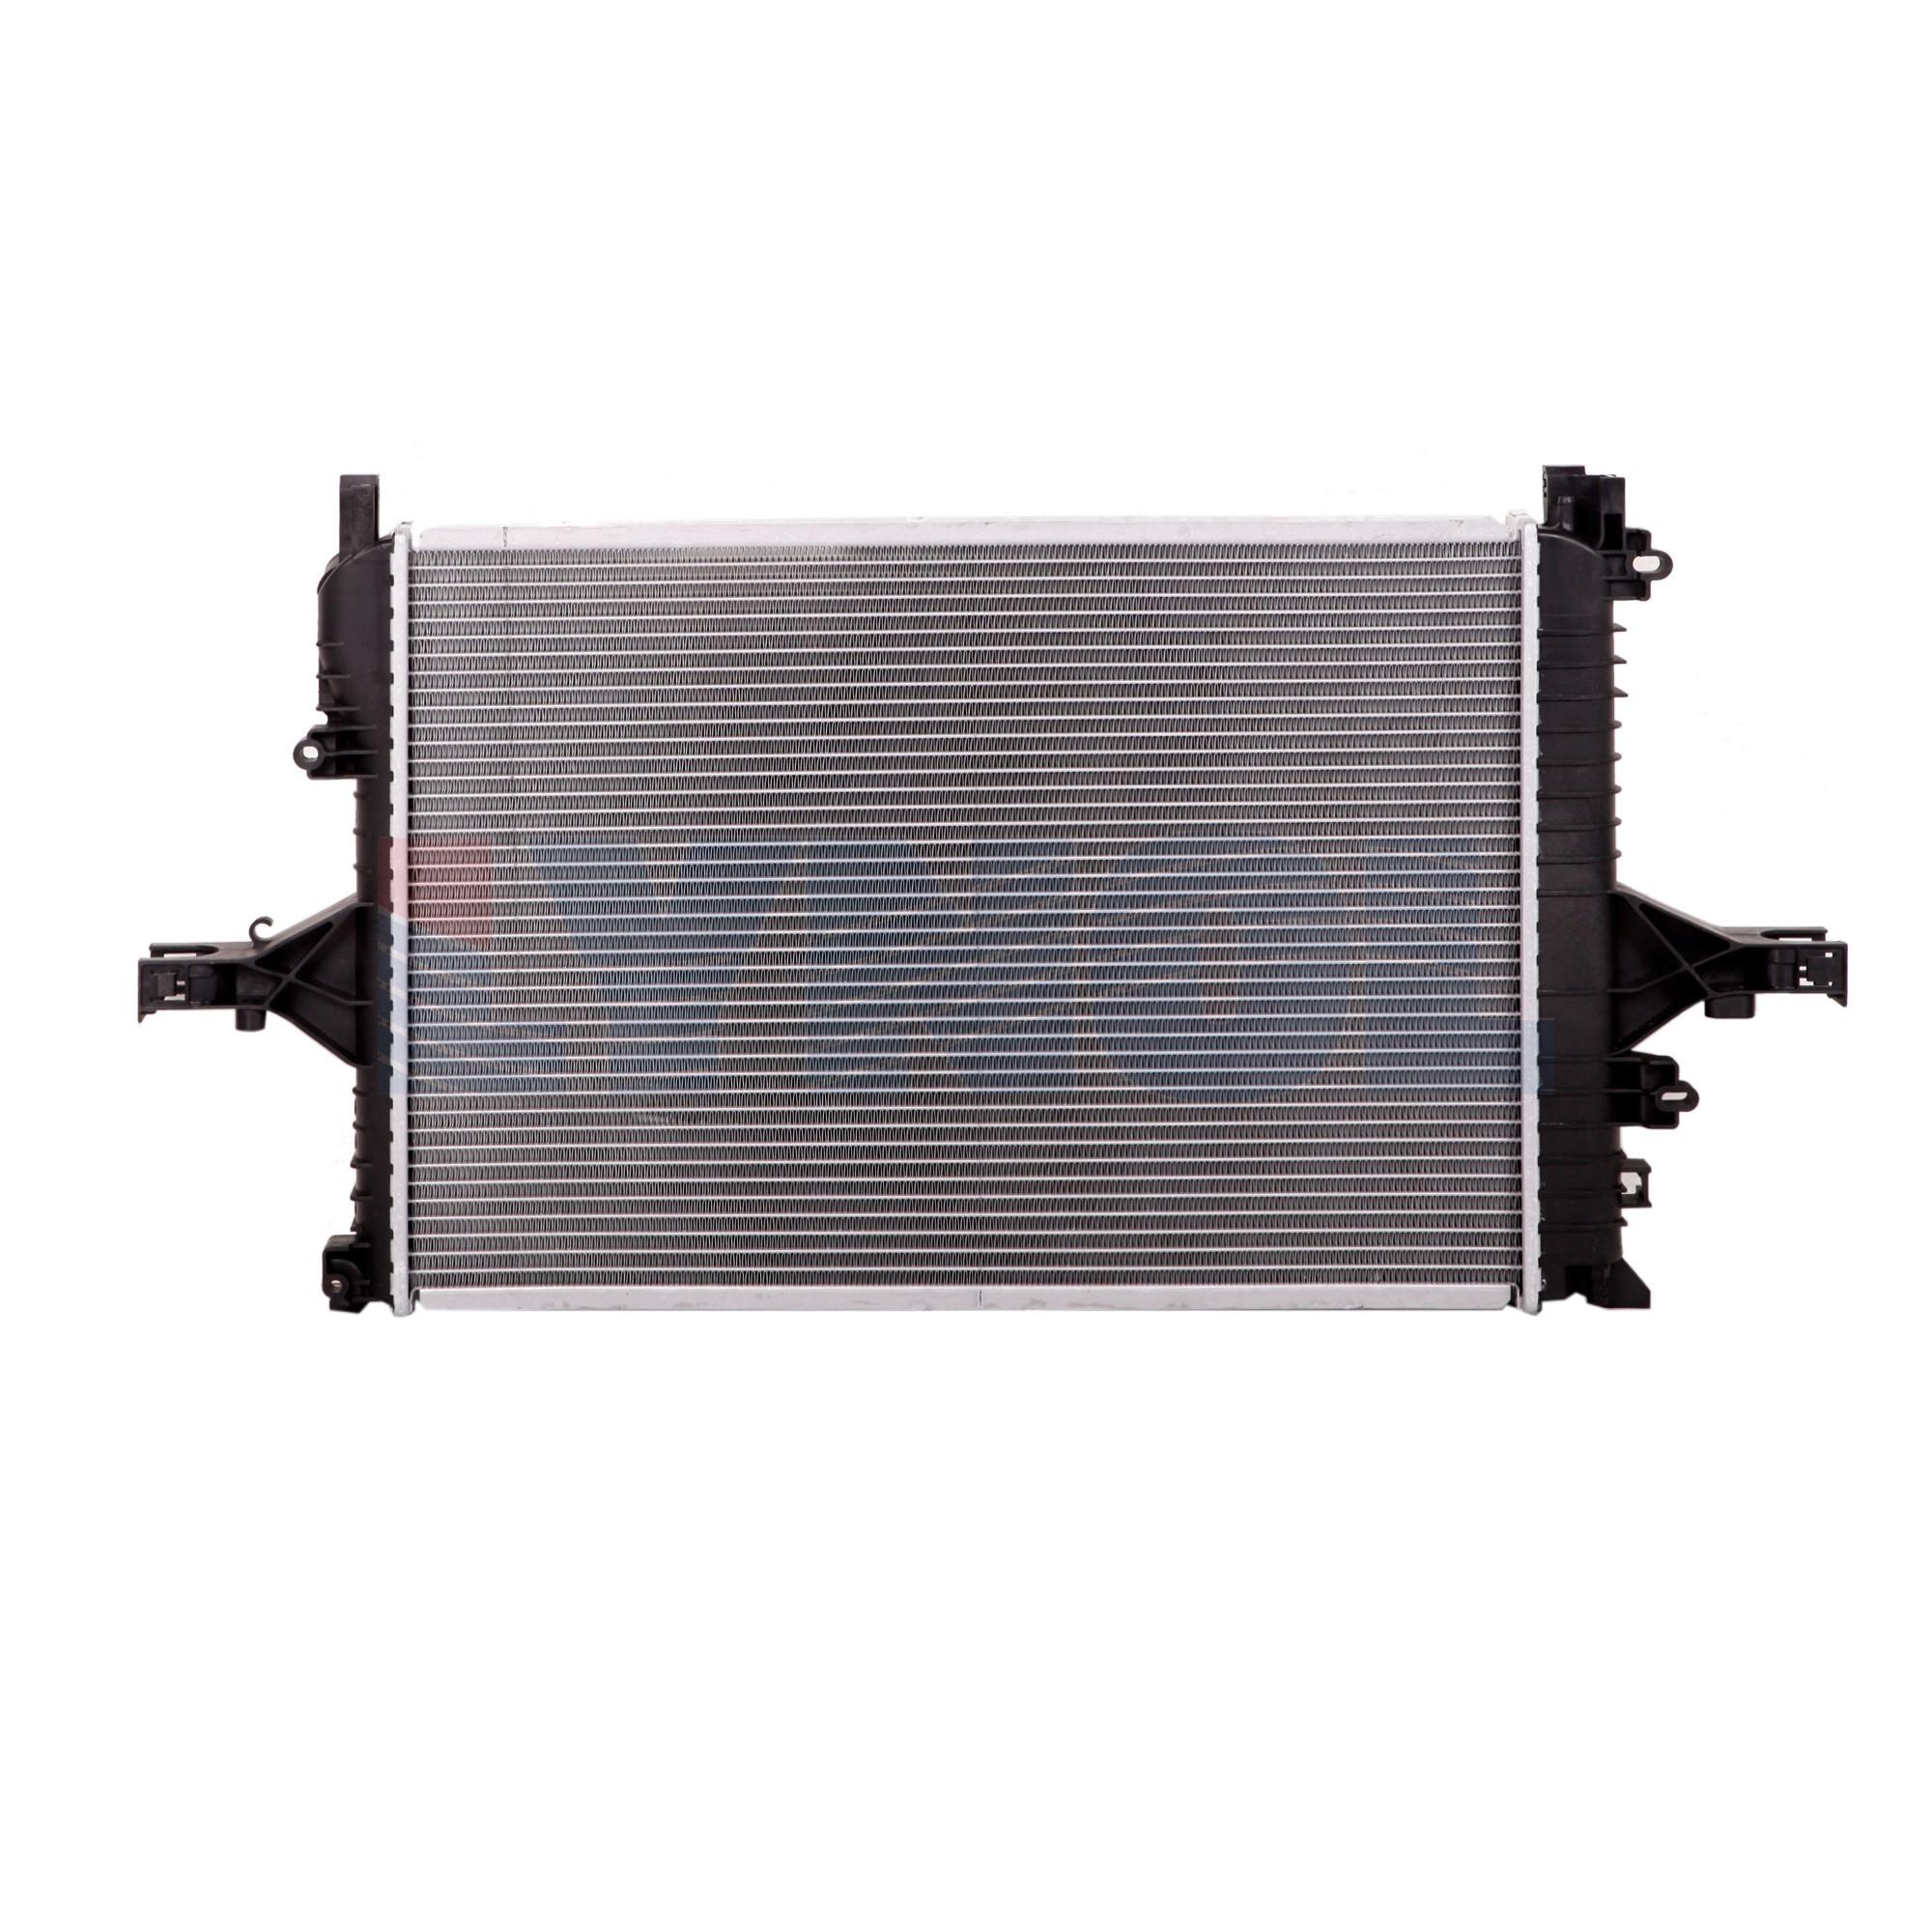 New Condenser For Volvo S60 01-05 S80 99-05 V70 XC70 2.3 2.4 2.5 L5 2.8 2.9 L6